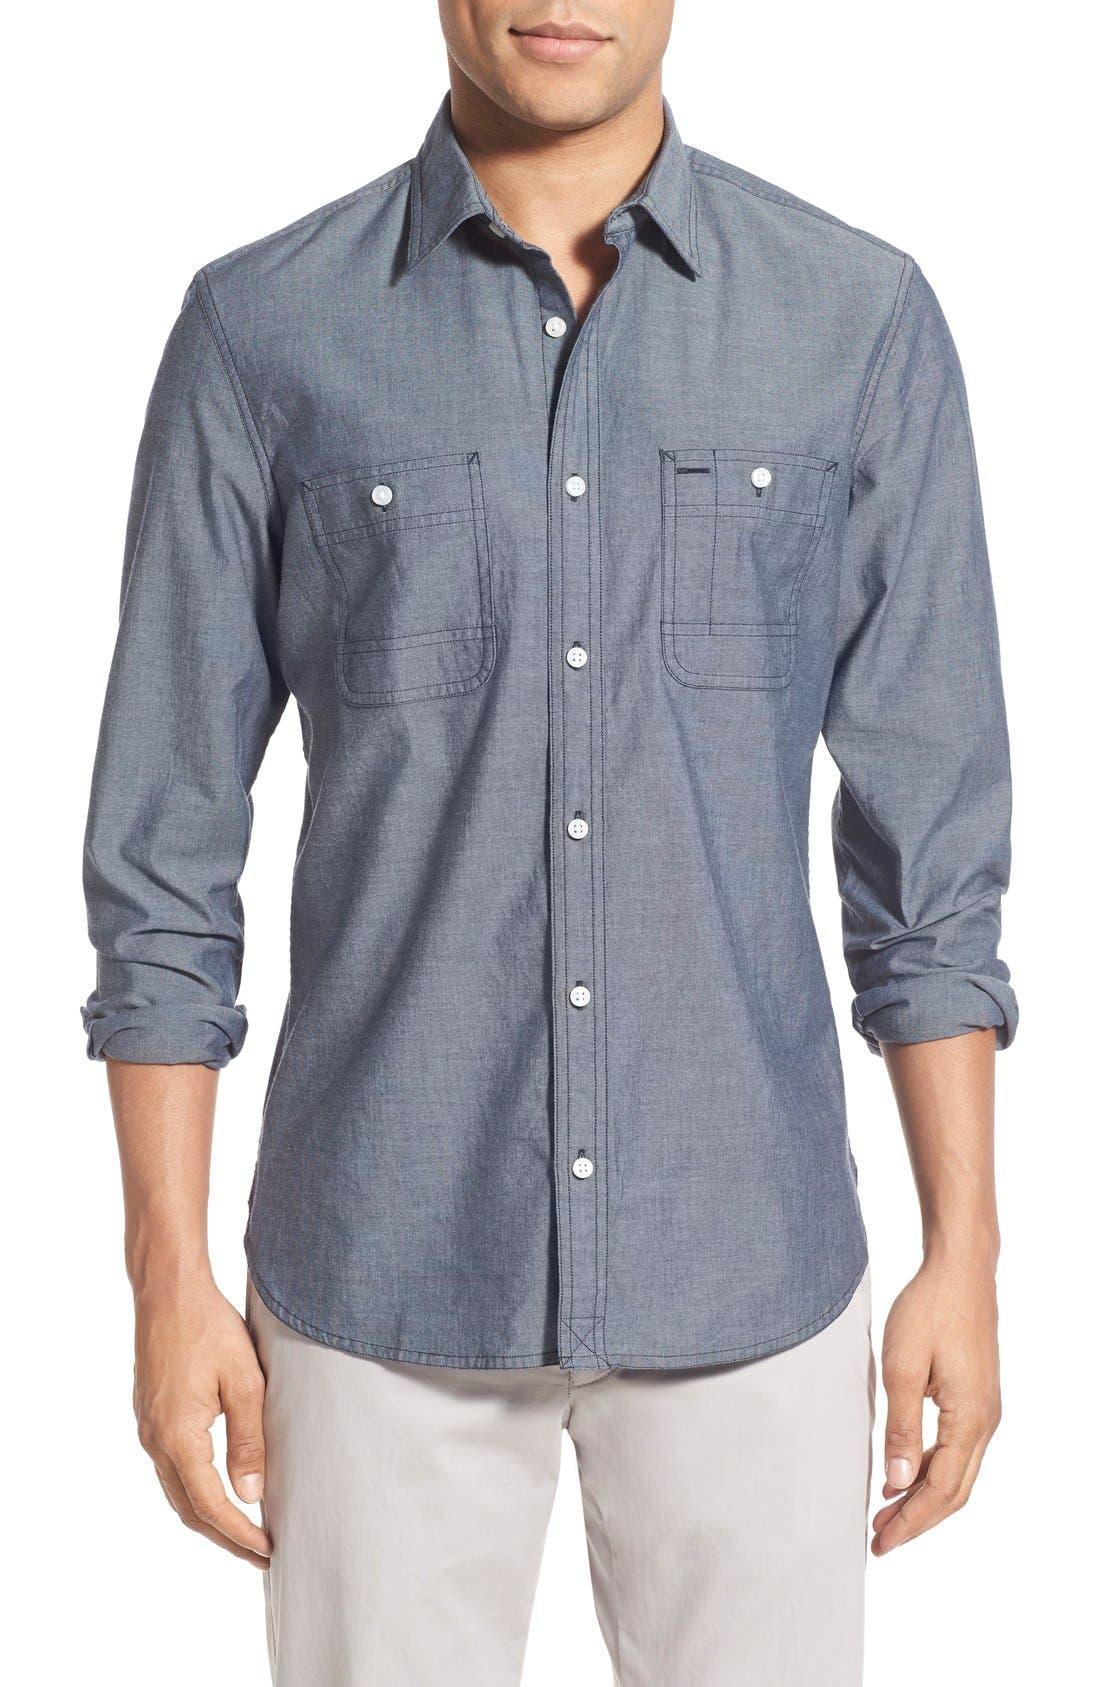 'Workwear' Trim Fit Chambray Sport Shirt,                             Main thumbnail 1, color,                             Light Blue